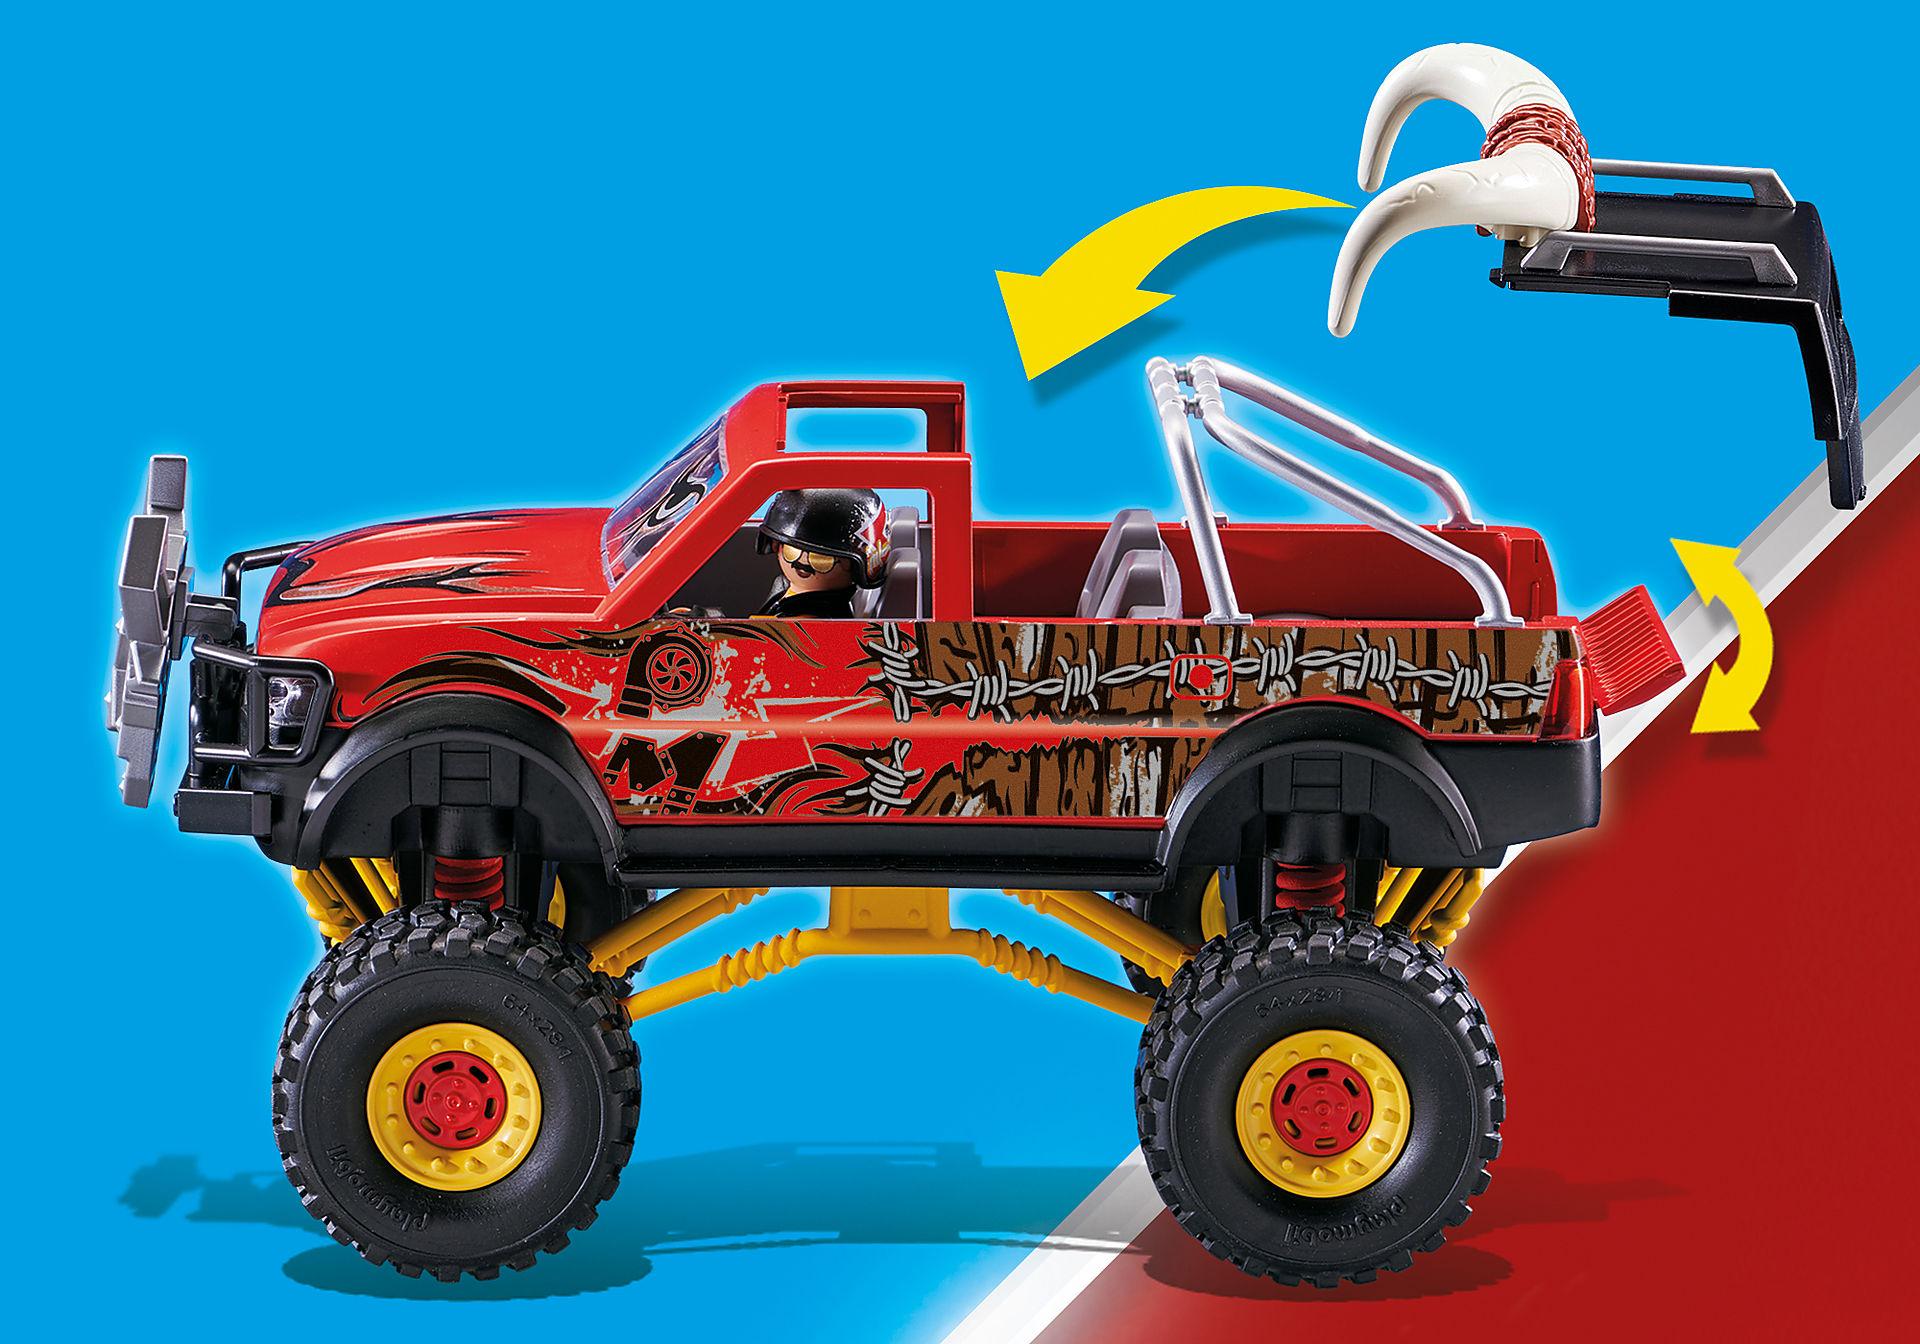 70549 Stuntshow Monster Truck Horned zoom image6